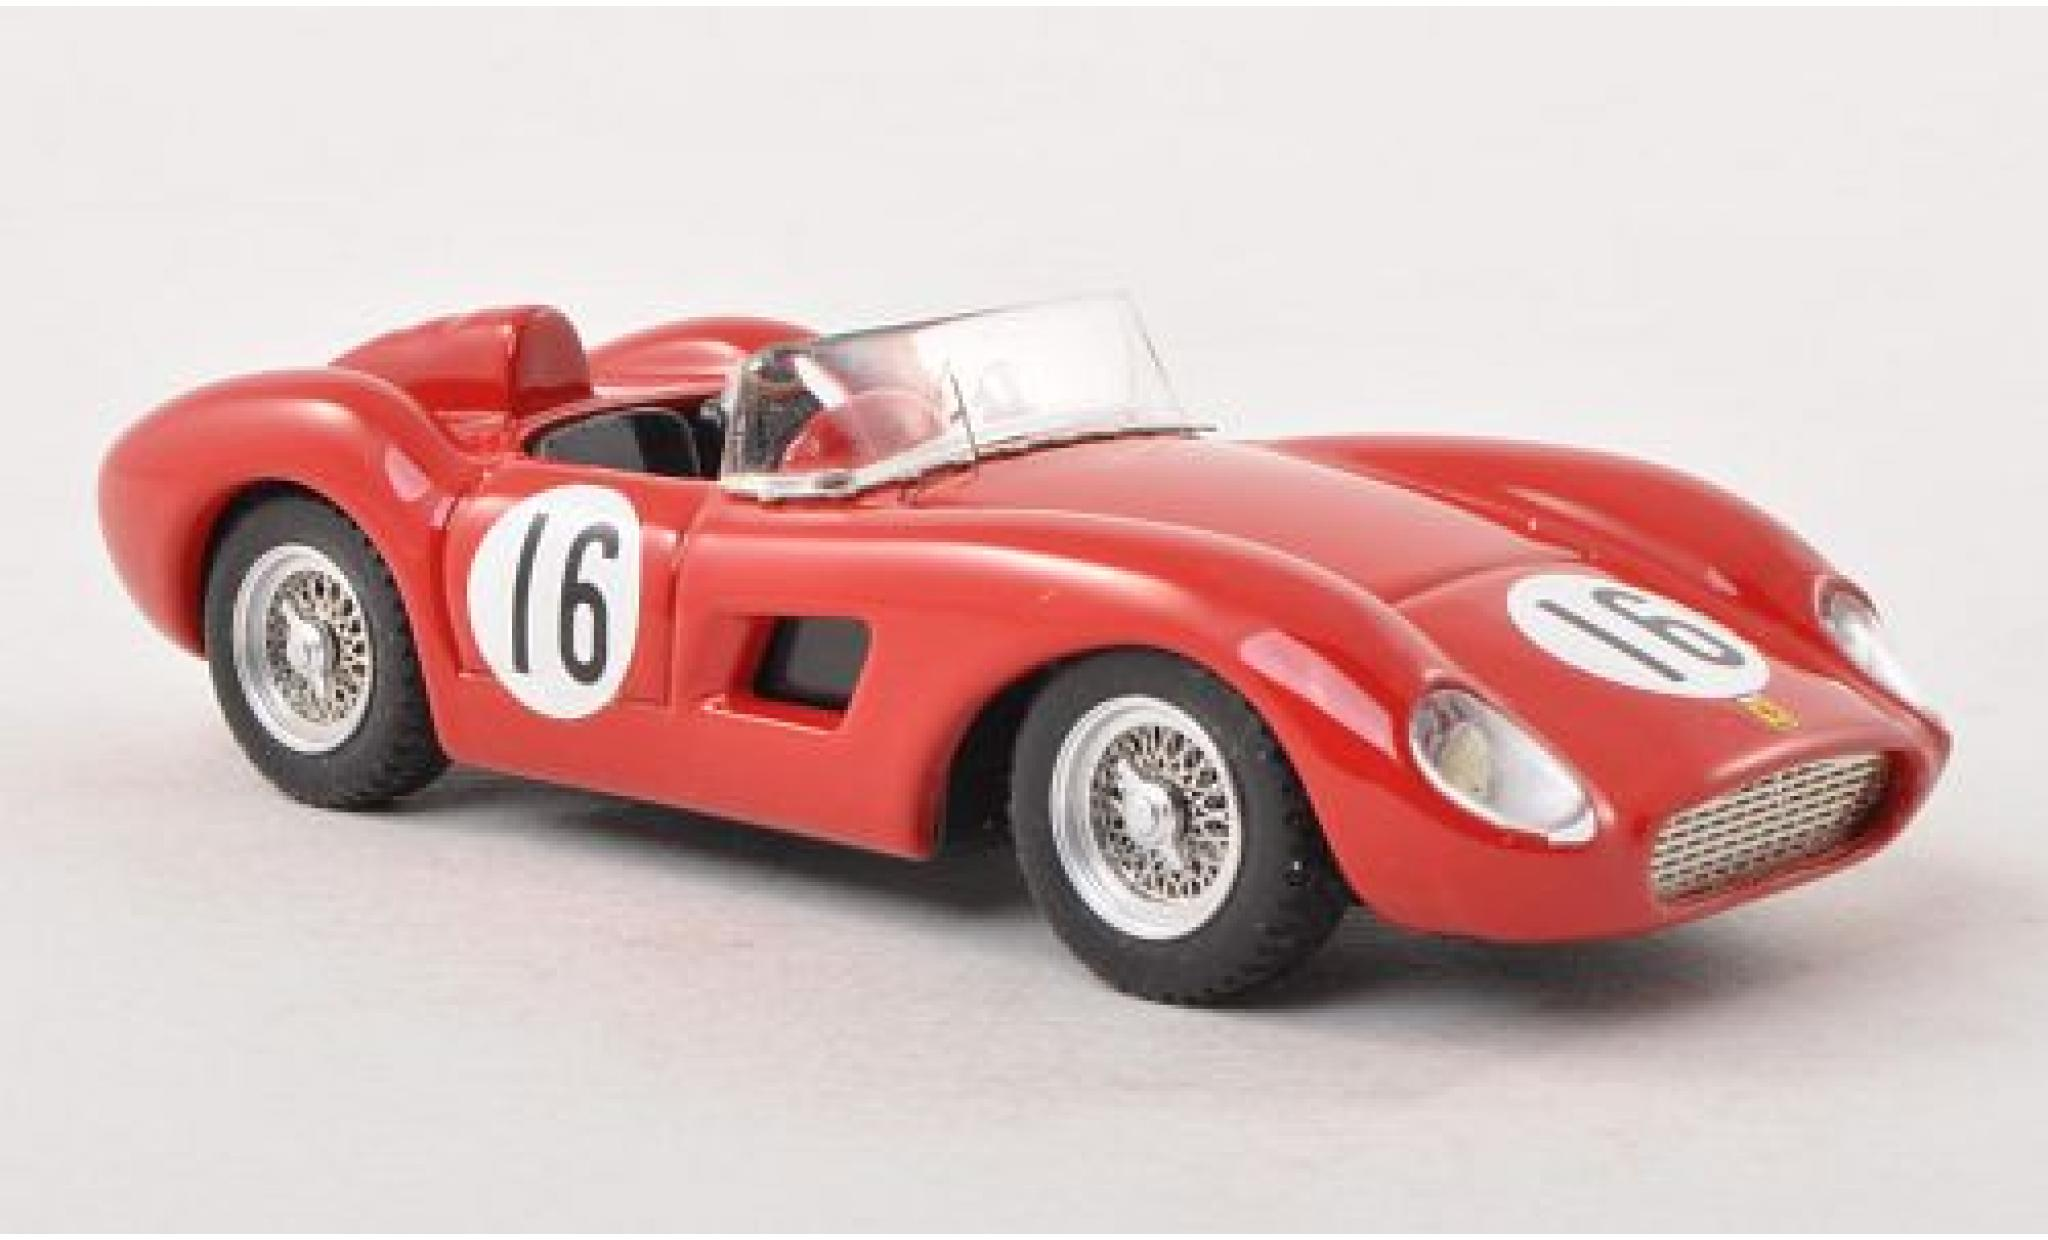 Ferrari 500 1/43 Art Model TRC No.16 Virginia 1957 W.Helbrun